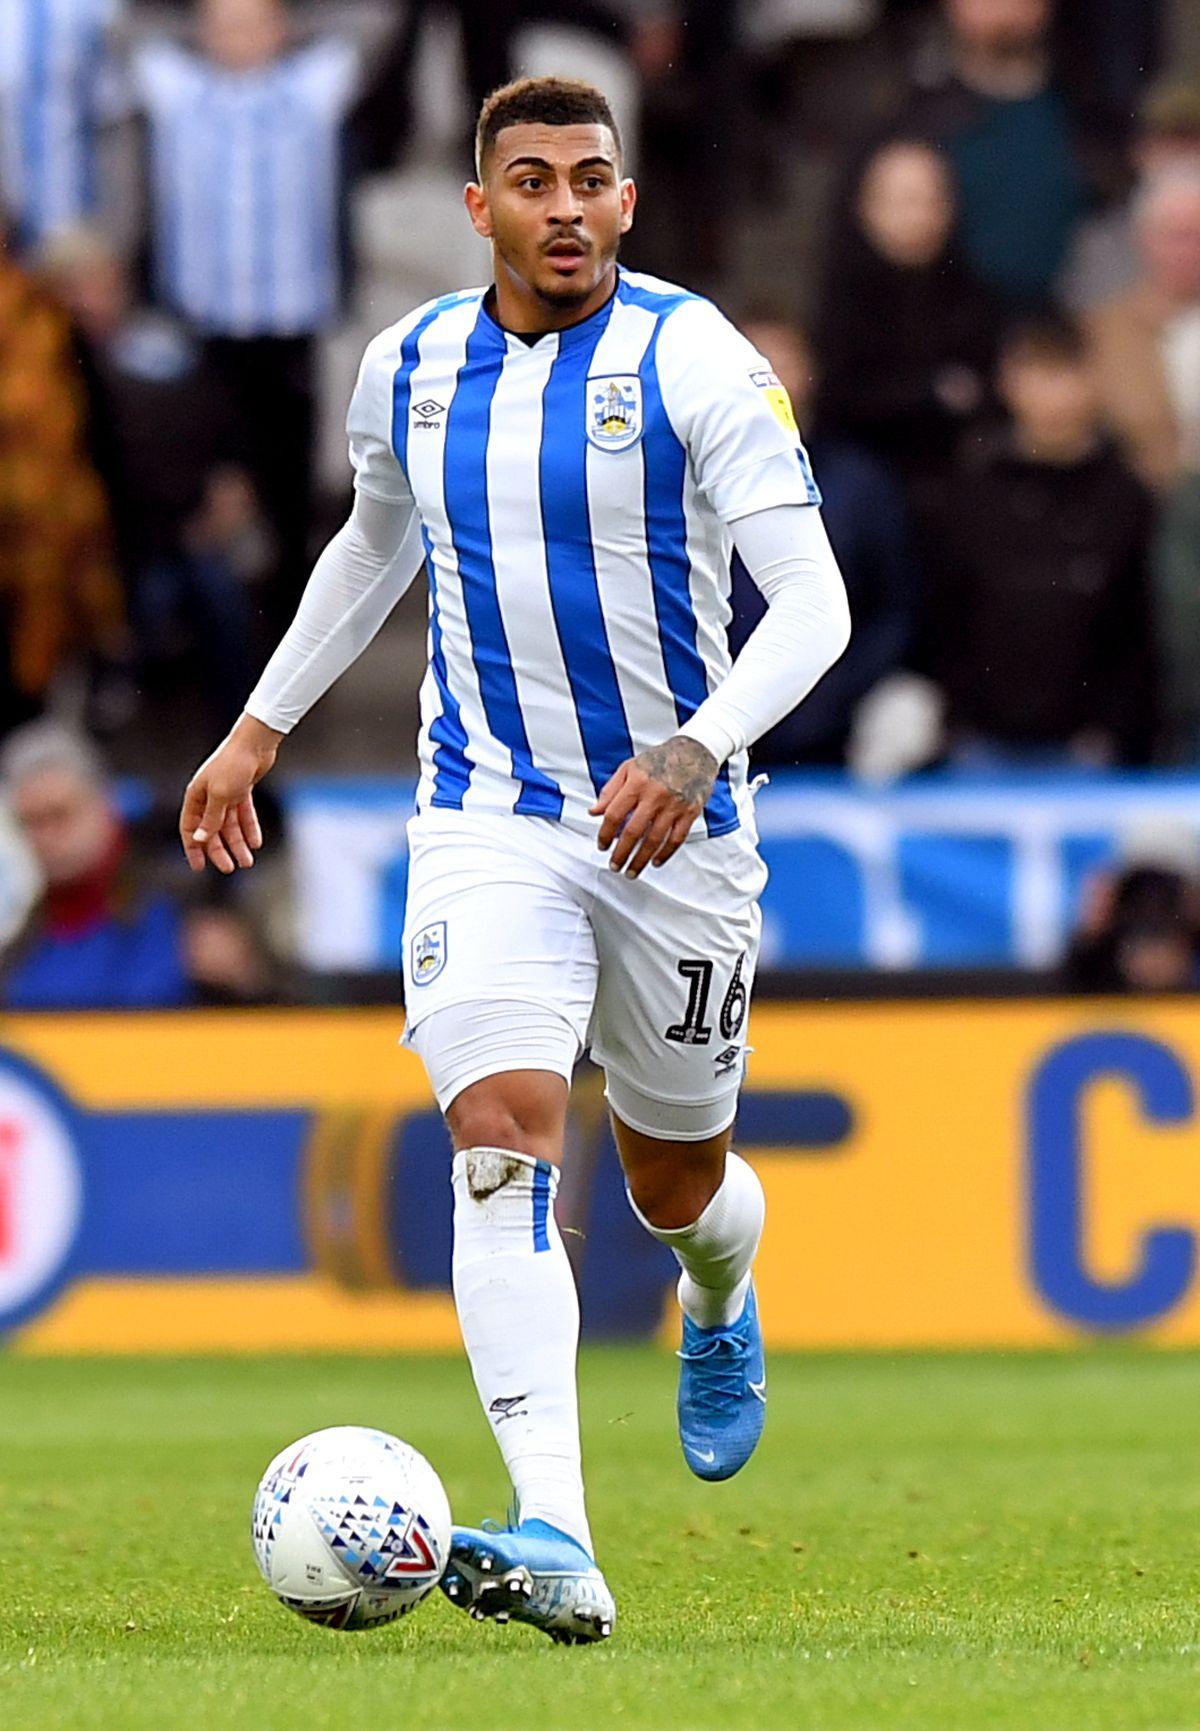 Huddersfield Town's Karlan Grant